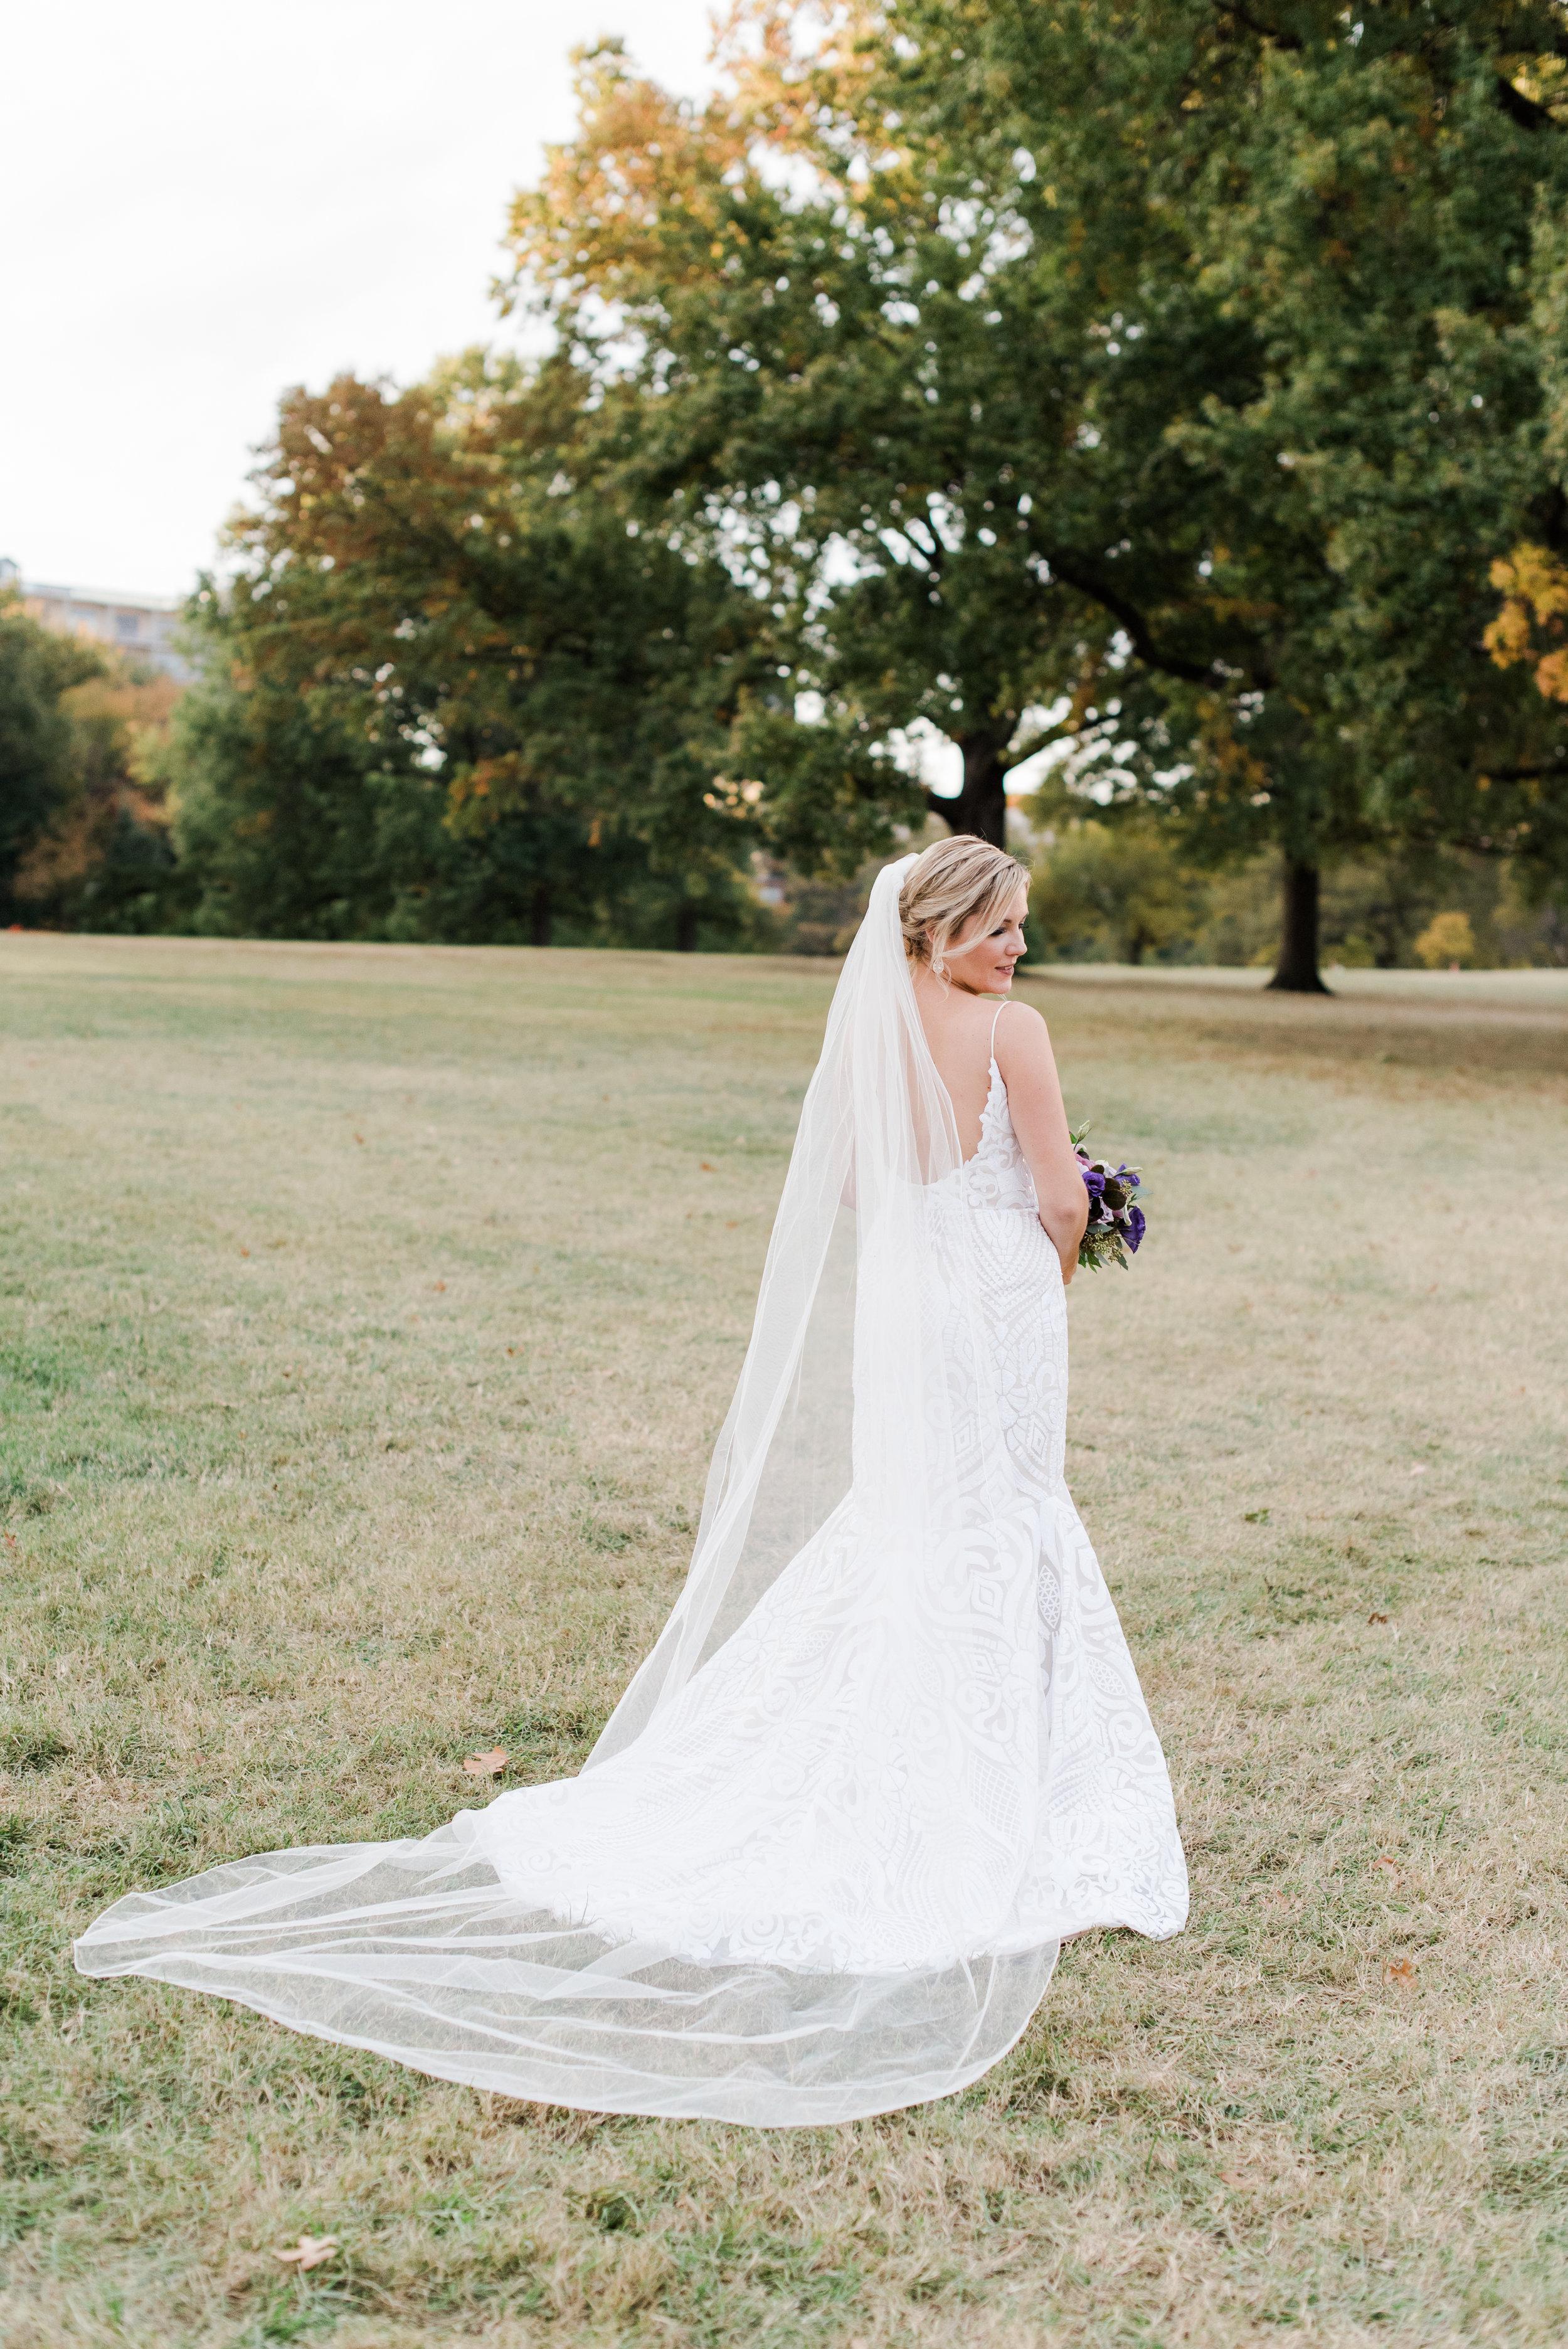 DavidAmandaMundy-Wedding-10282017-KathrynIvyPhotography-359.jpg